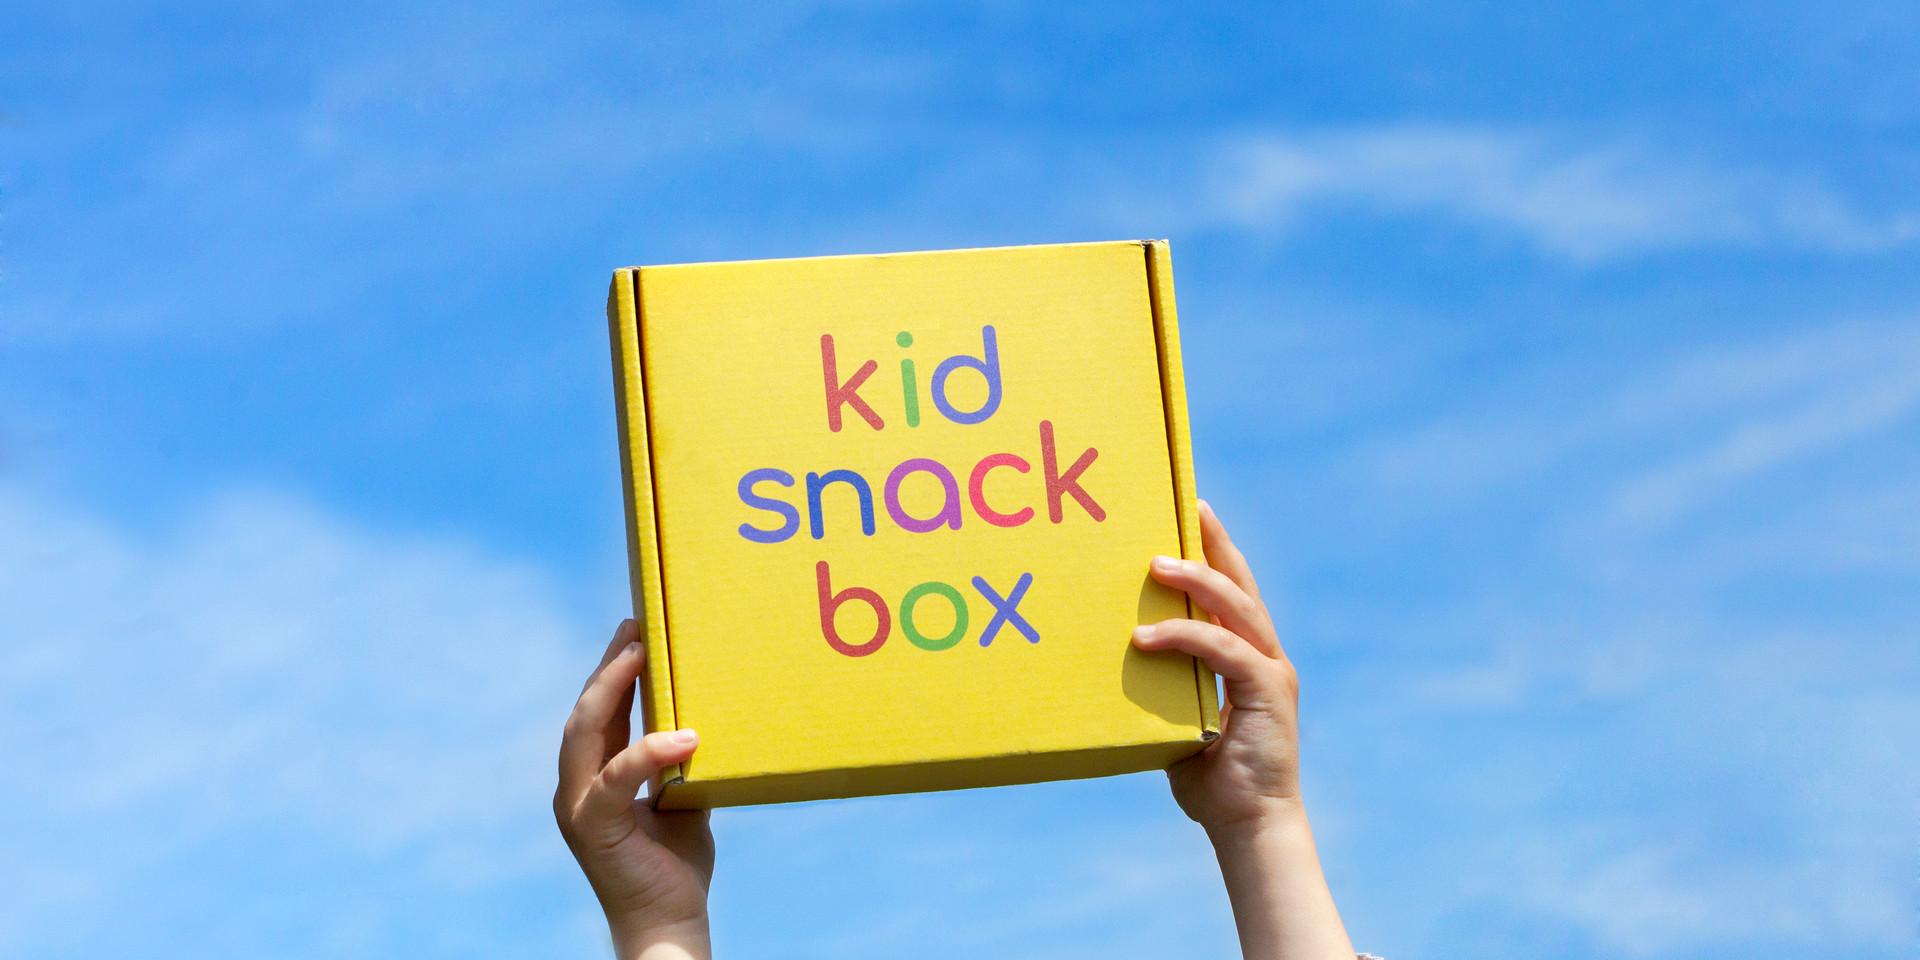 Kid Snack Box